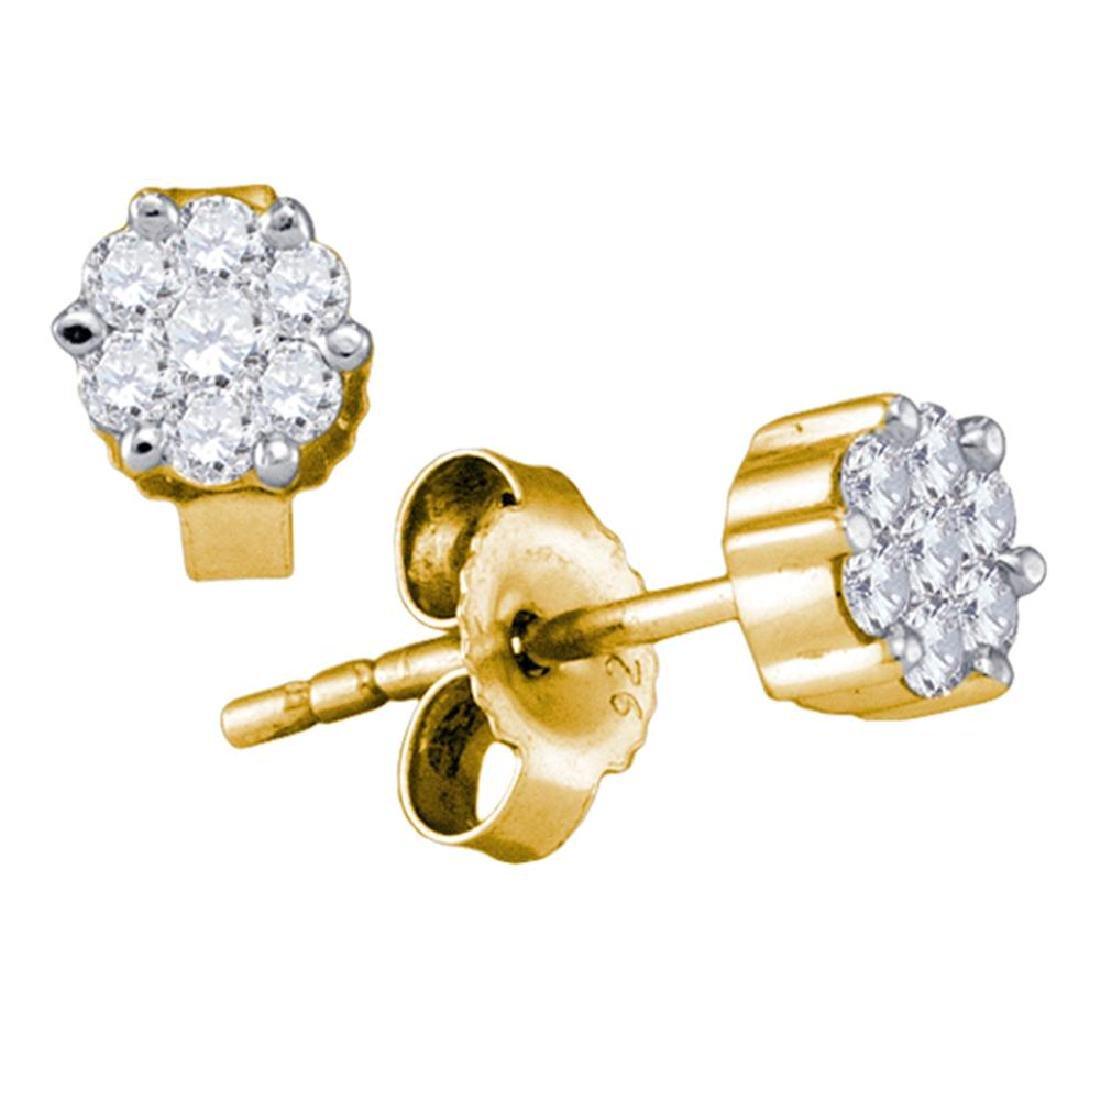 0.35 CTW Diamond Flower Cluster Earrings 14KT Yellow